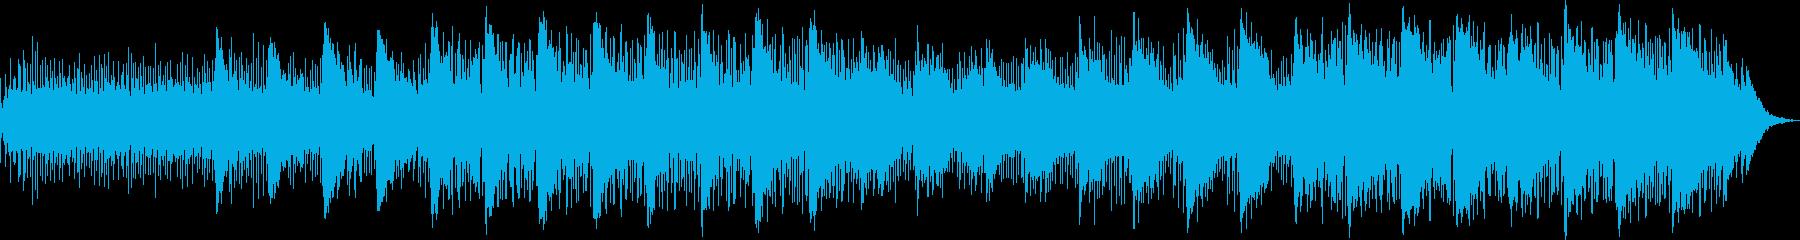 Inspiring Presentatiの再生済みの波形